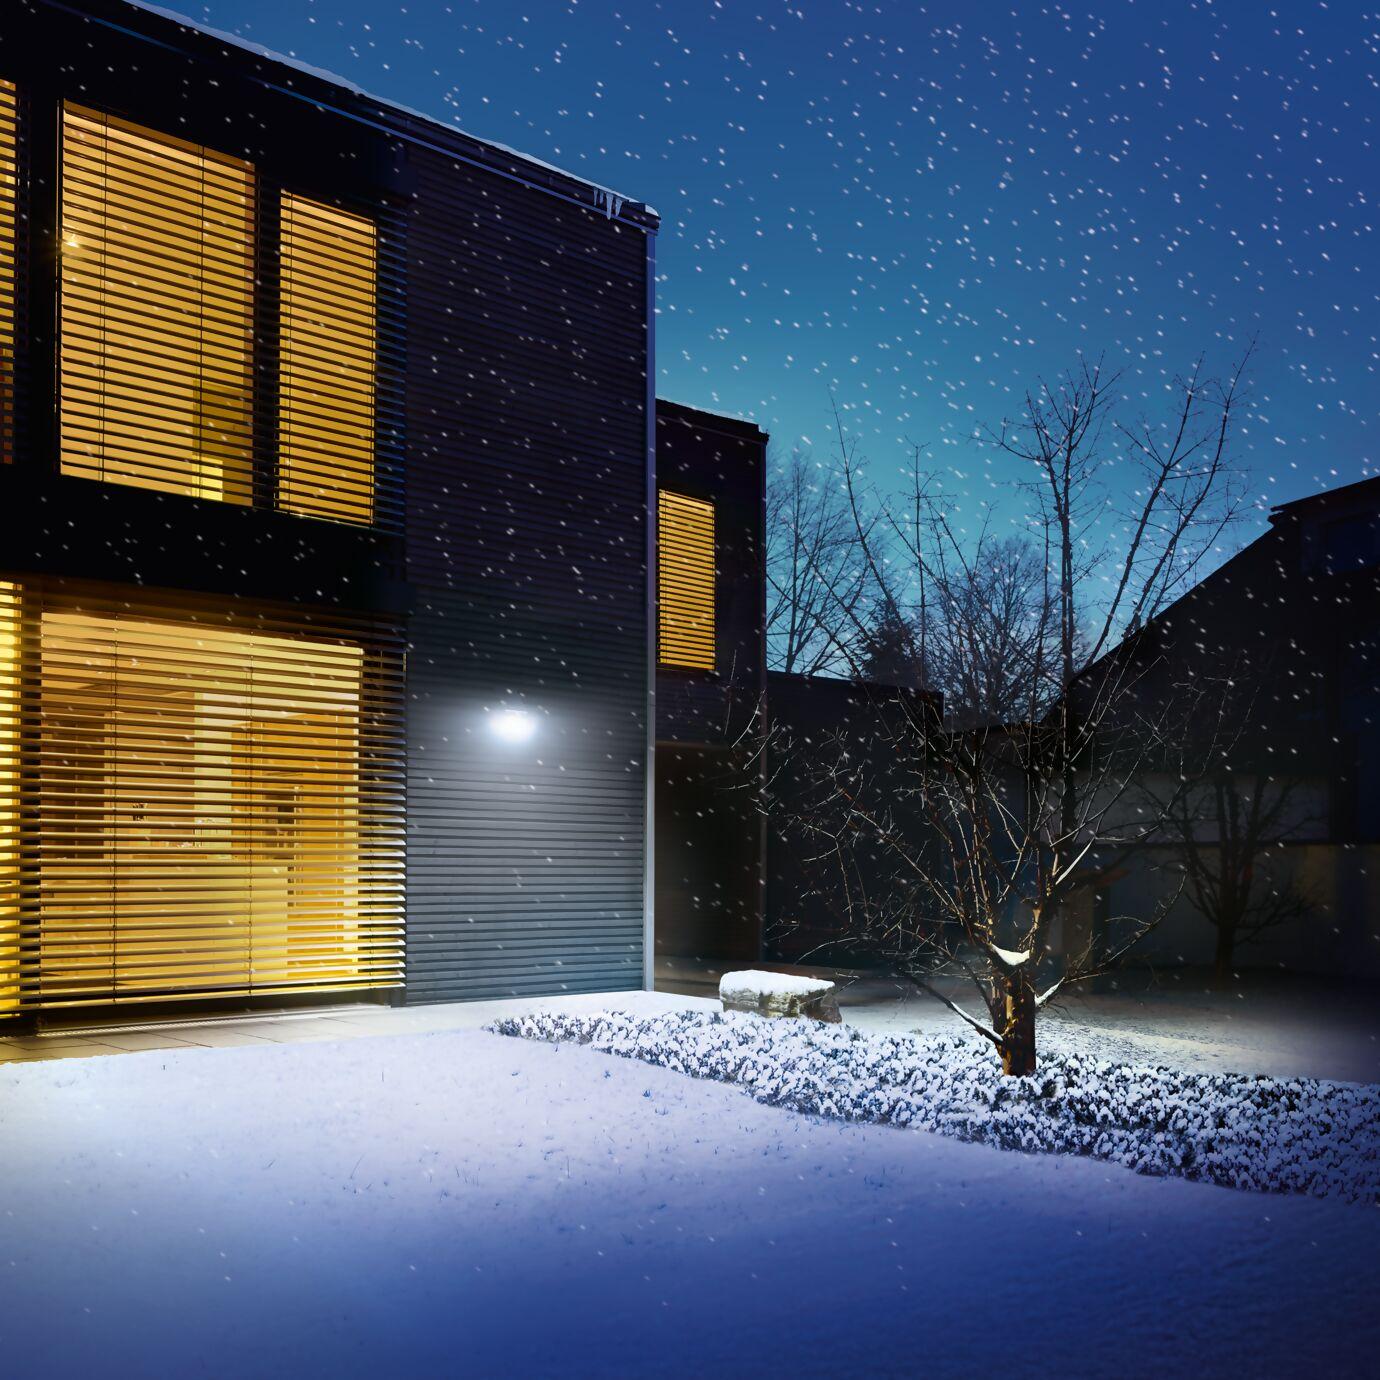 solarleuchten-xsolar-moodbild-winter.png